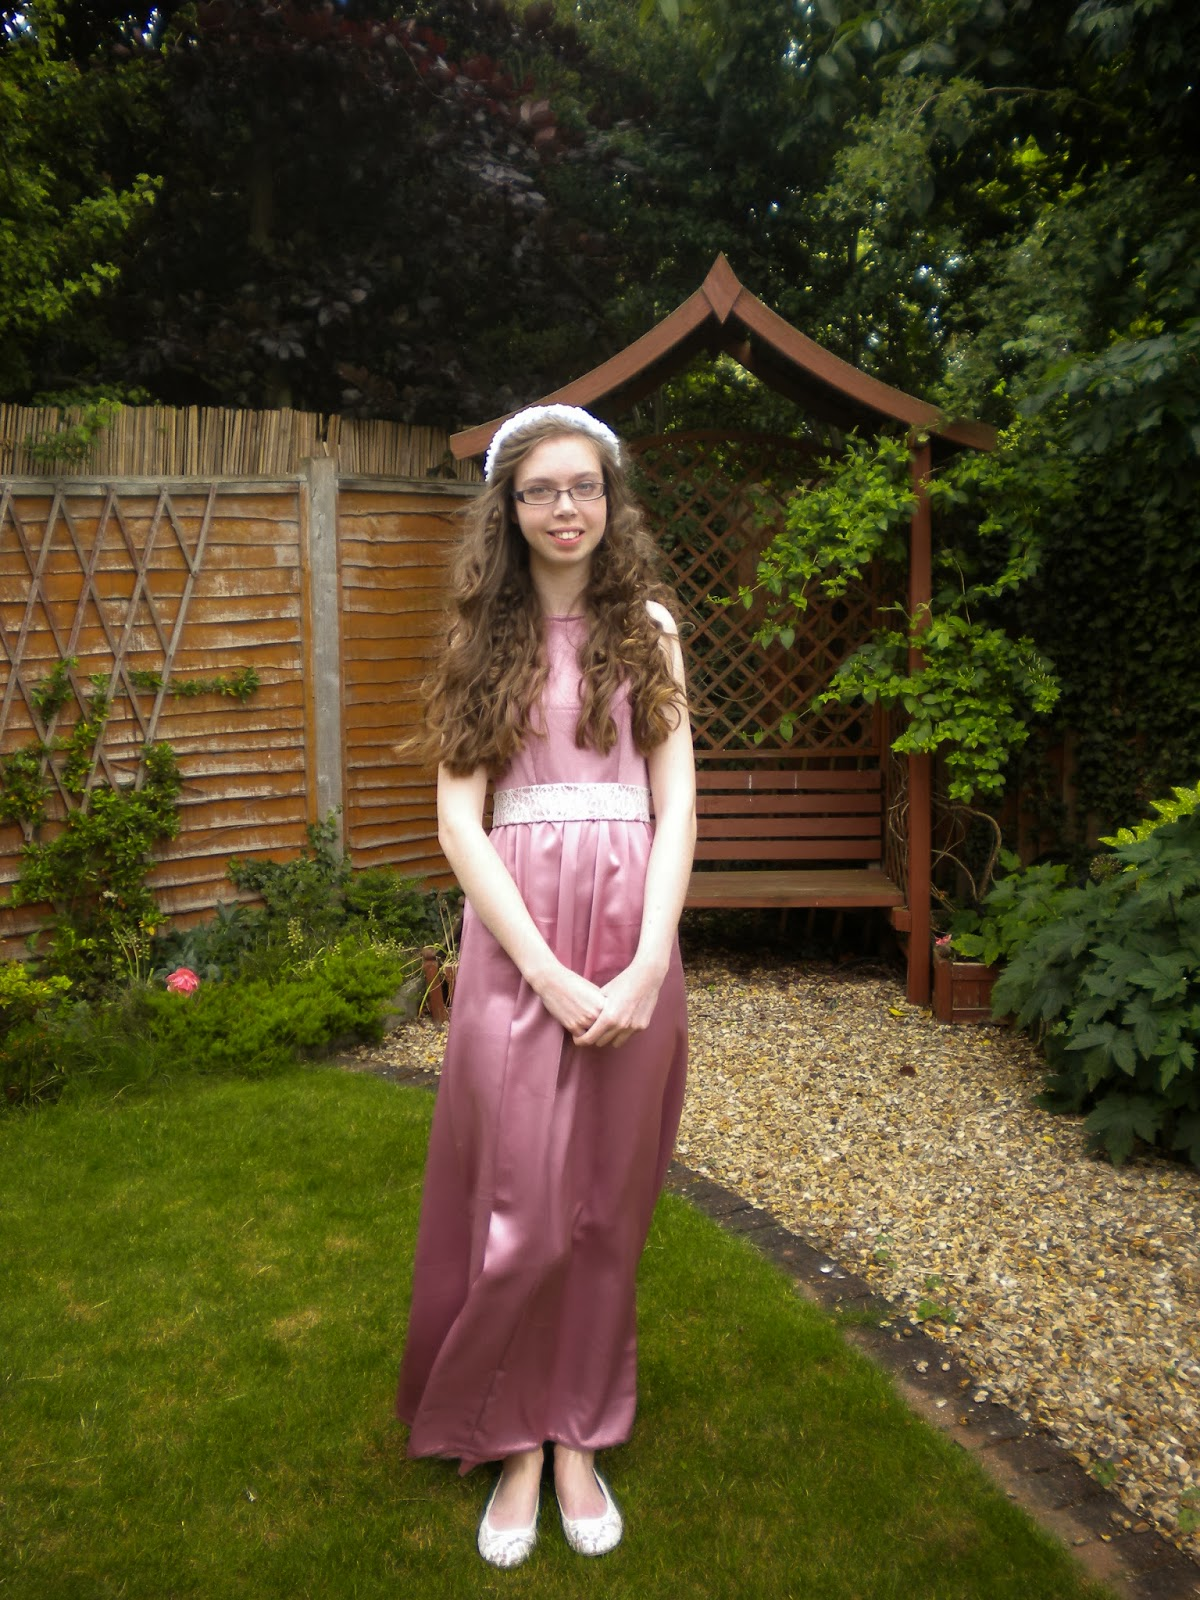 Lady Sewalot: My Prom dress!